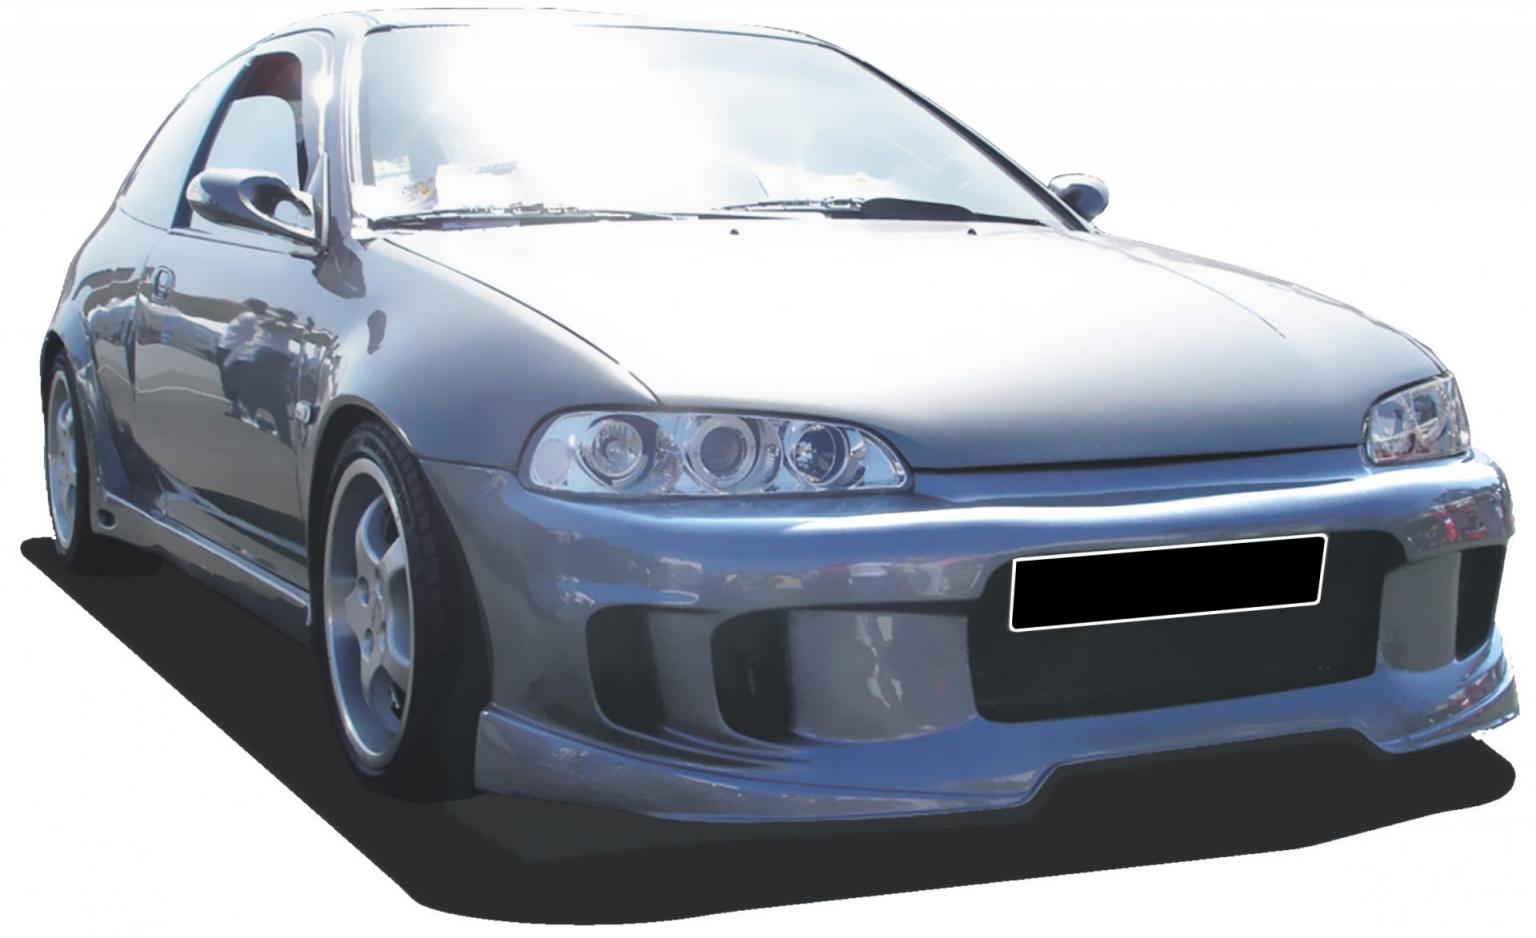 Honda-Civic-92-Spyder-frt-PCA210